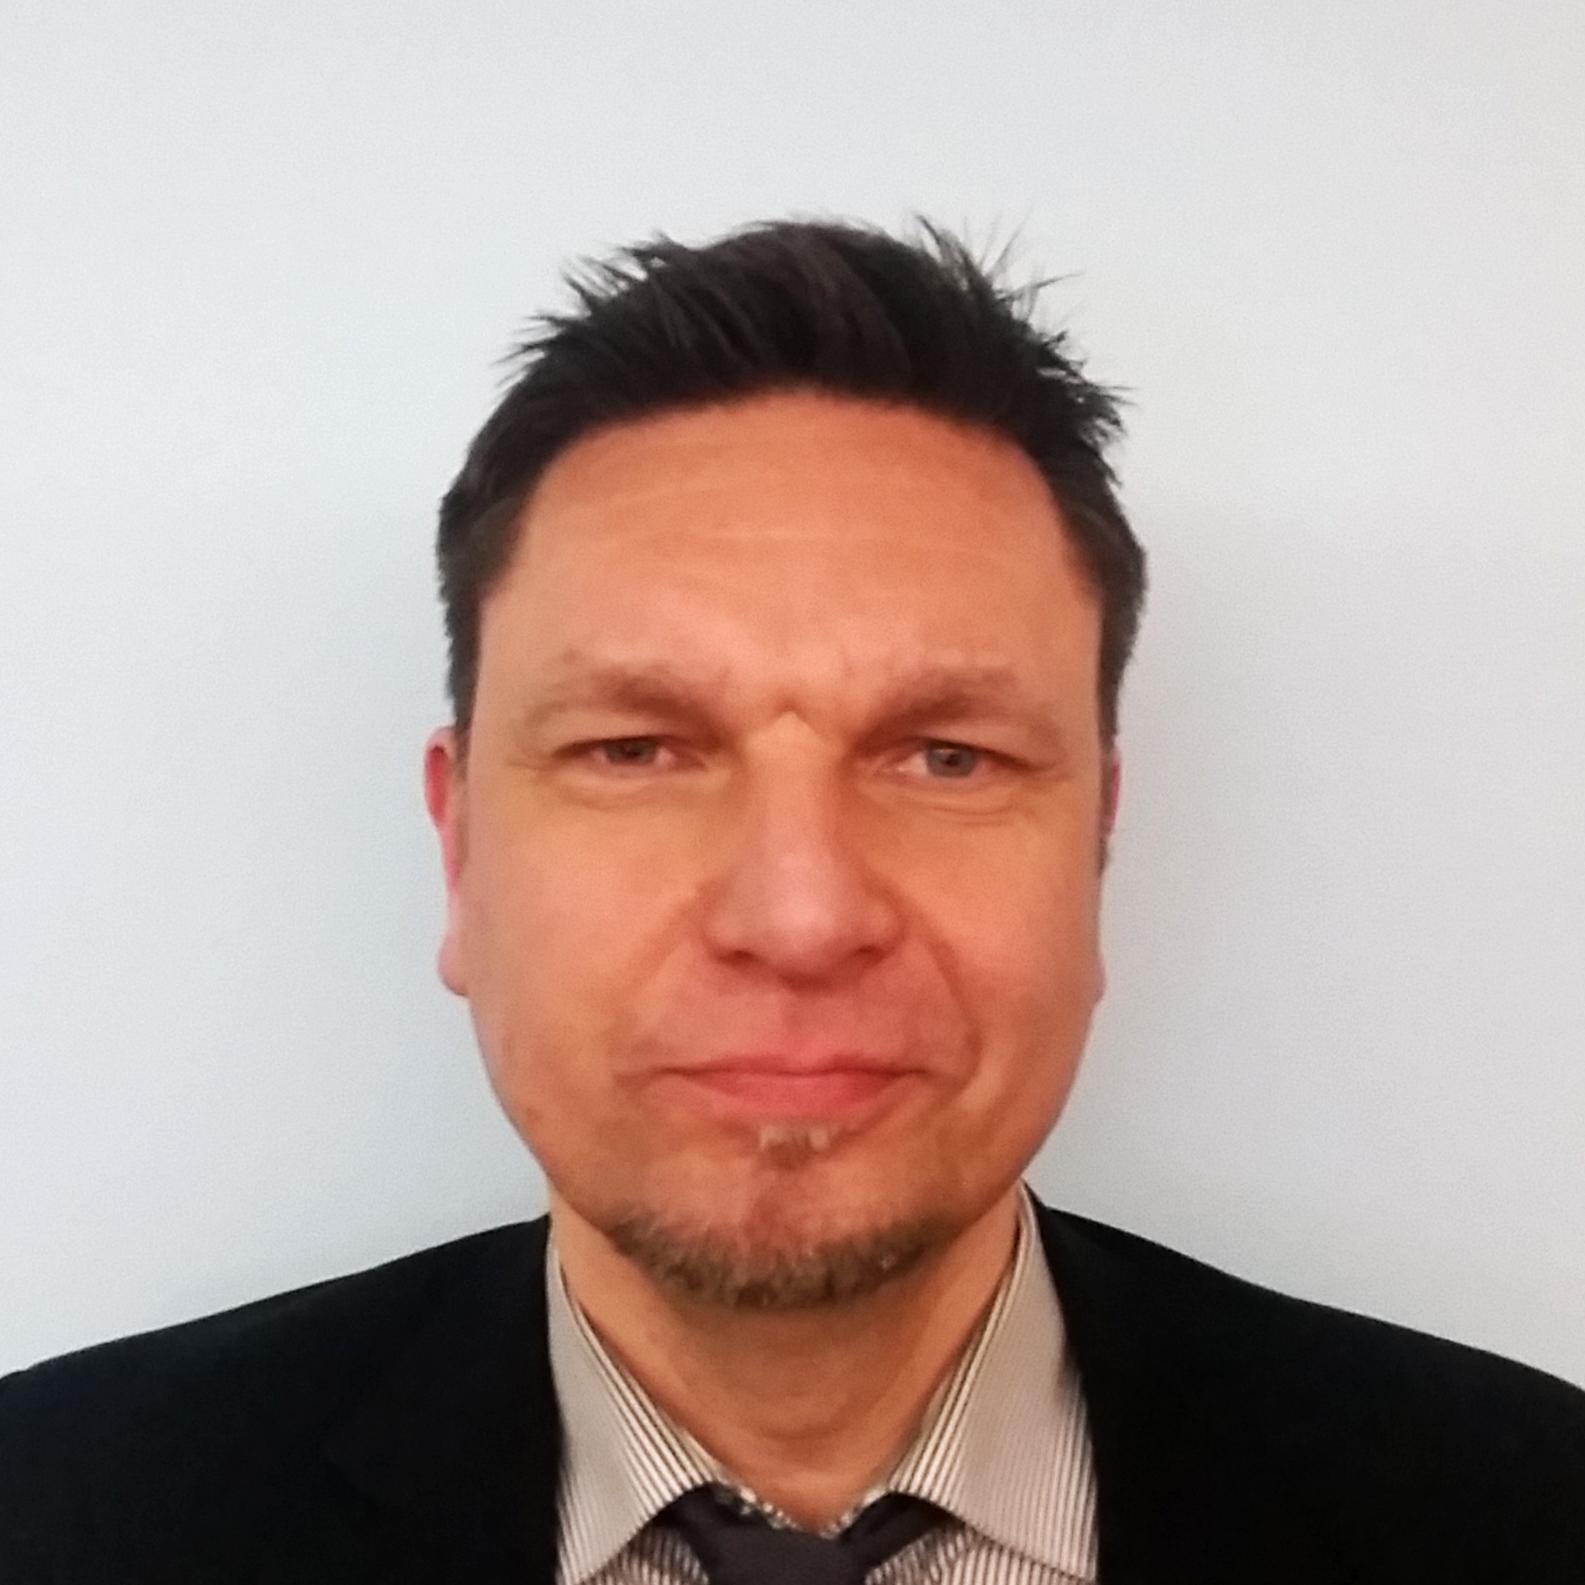 Michael Spremberg